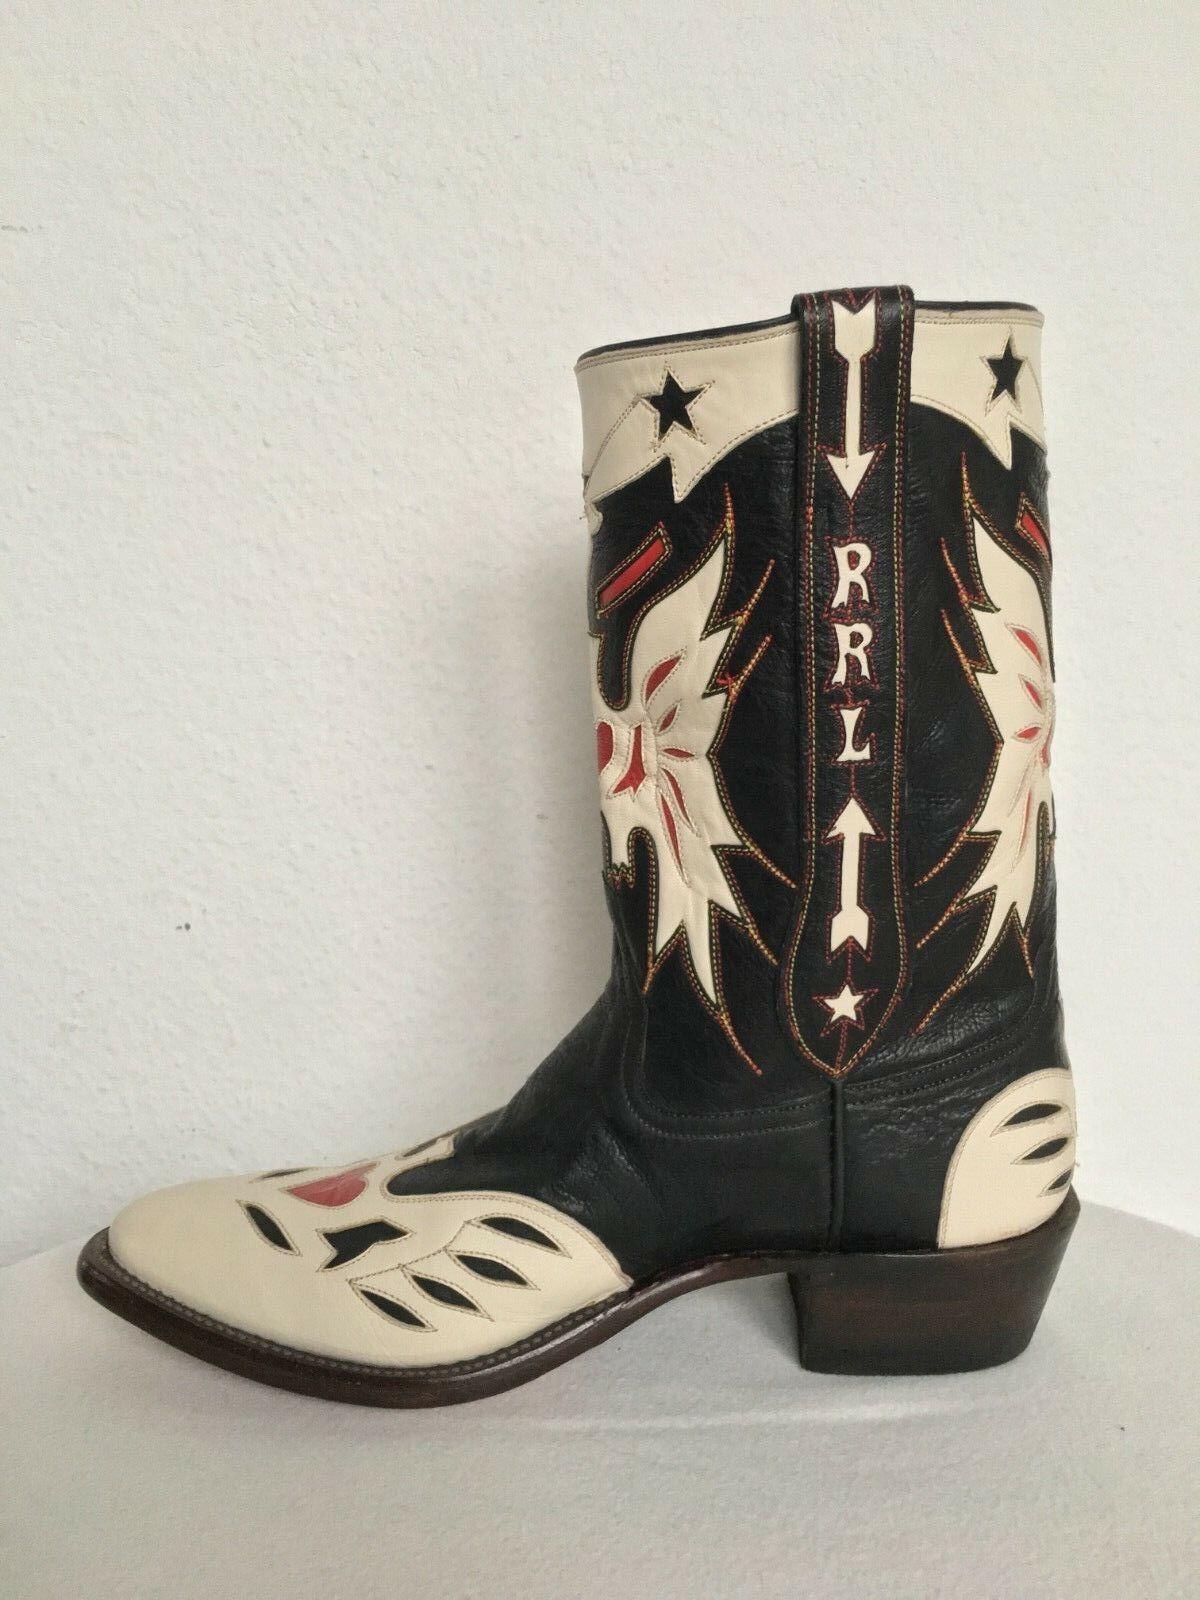 Ralph Lauren Double Rl, botas vaqueras, cuero, US 11 d ( ), 1.000,-